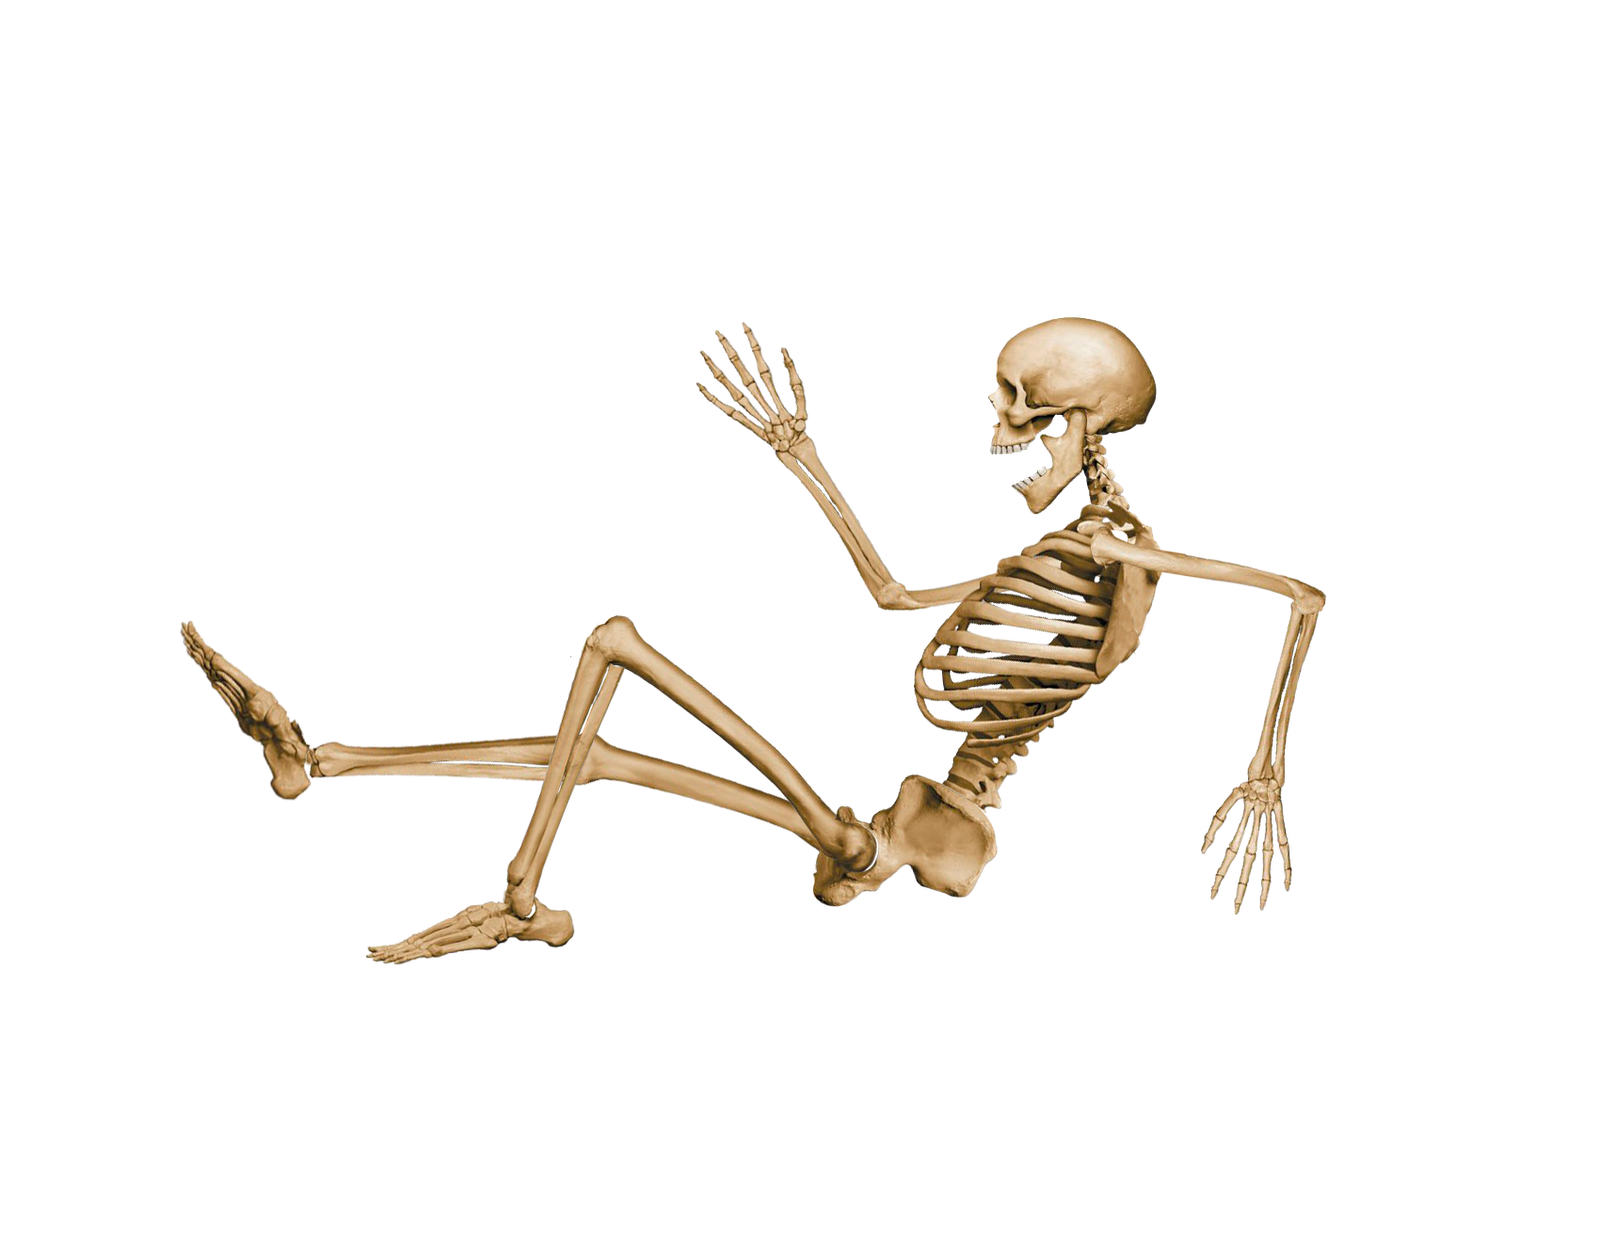 Human bones png - photo#7